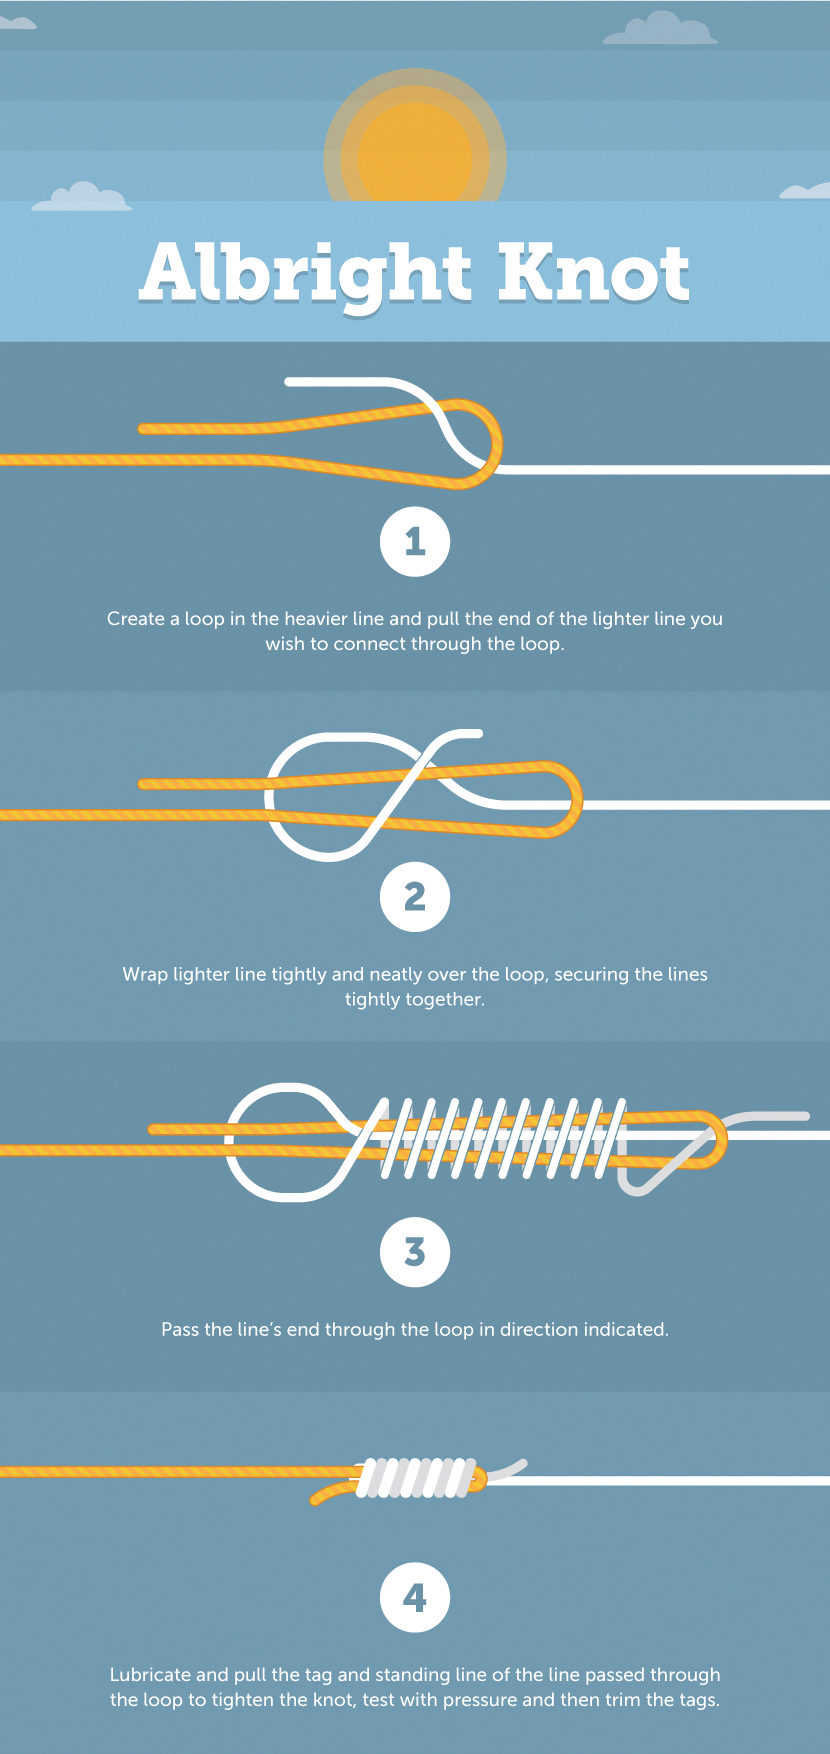 Albright Knot Fishing Knot Encyclopedia Poradnik